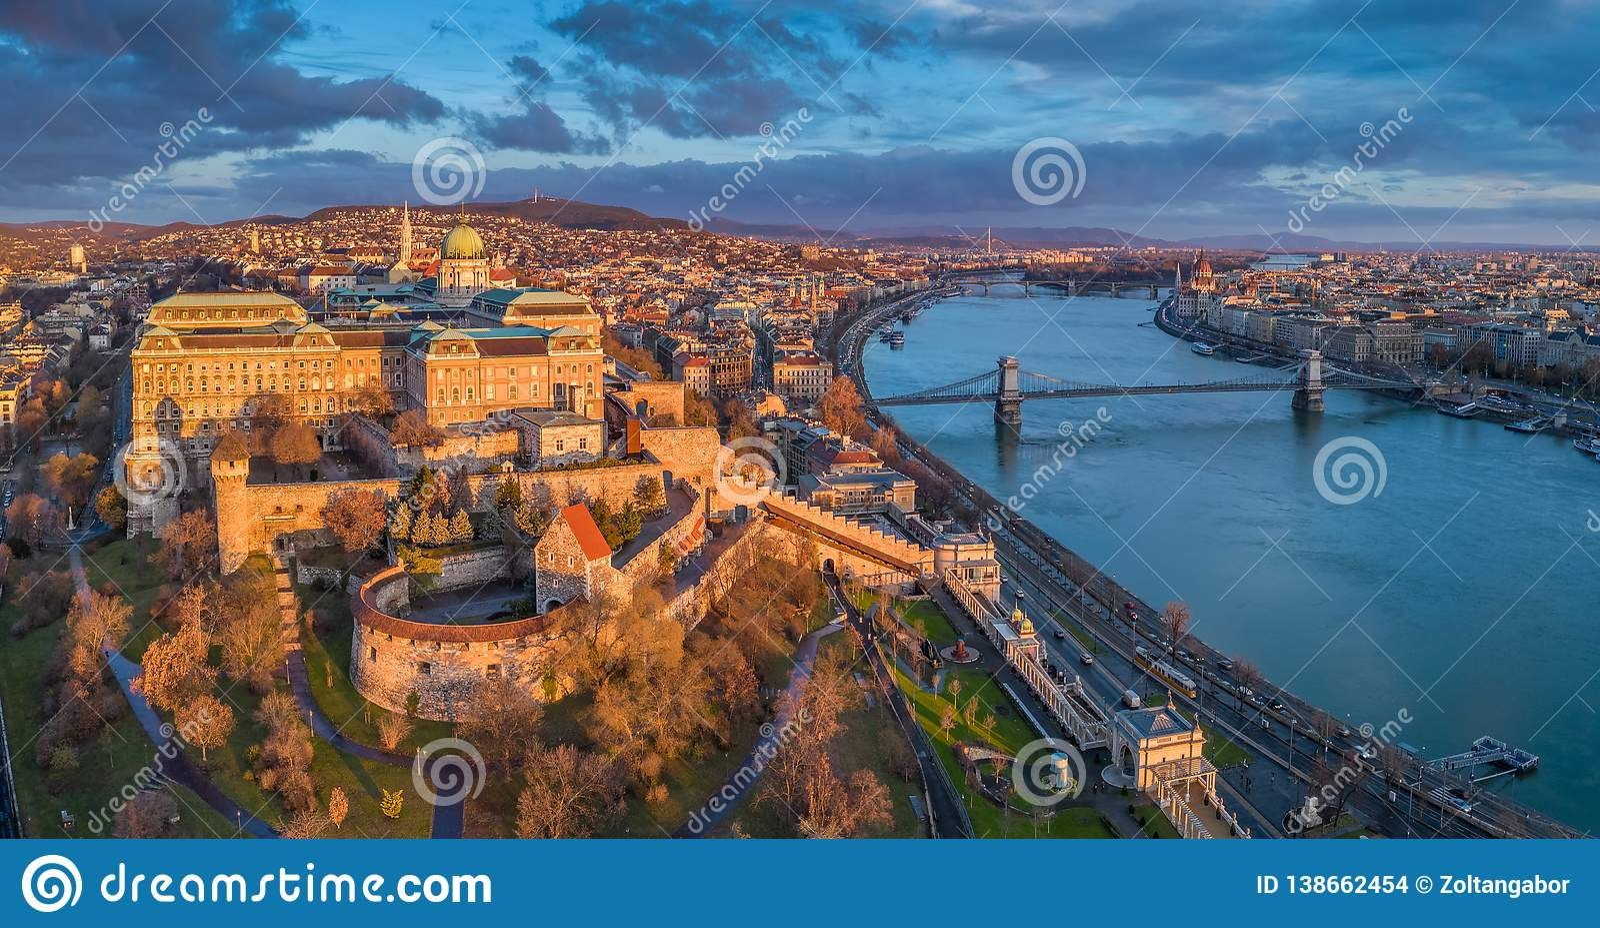 Boedapest, Hongarije - Luchtpanorama van Buda Castle Royal Palace met Szechenyi-Kettingsbrug, het Parlement